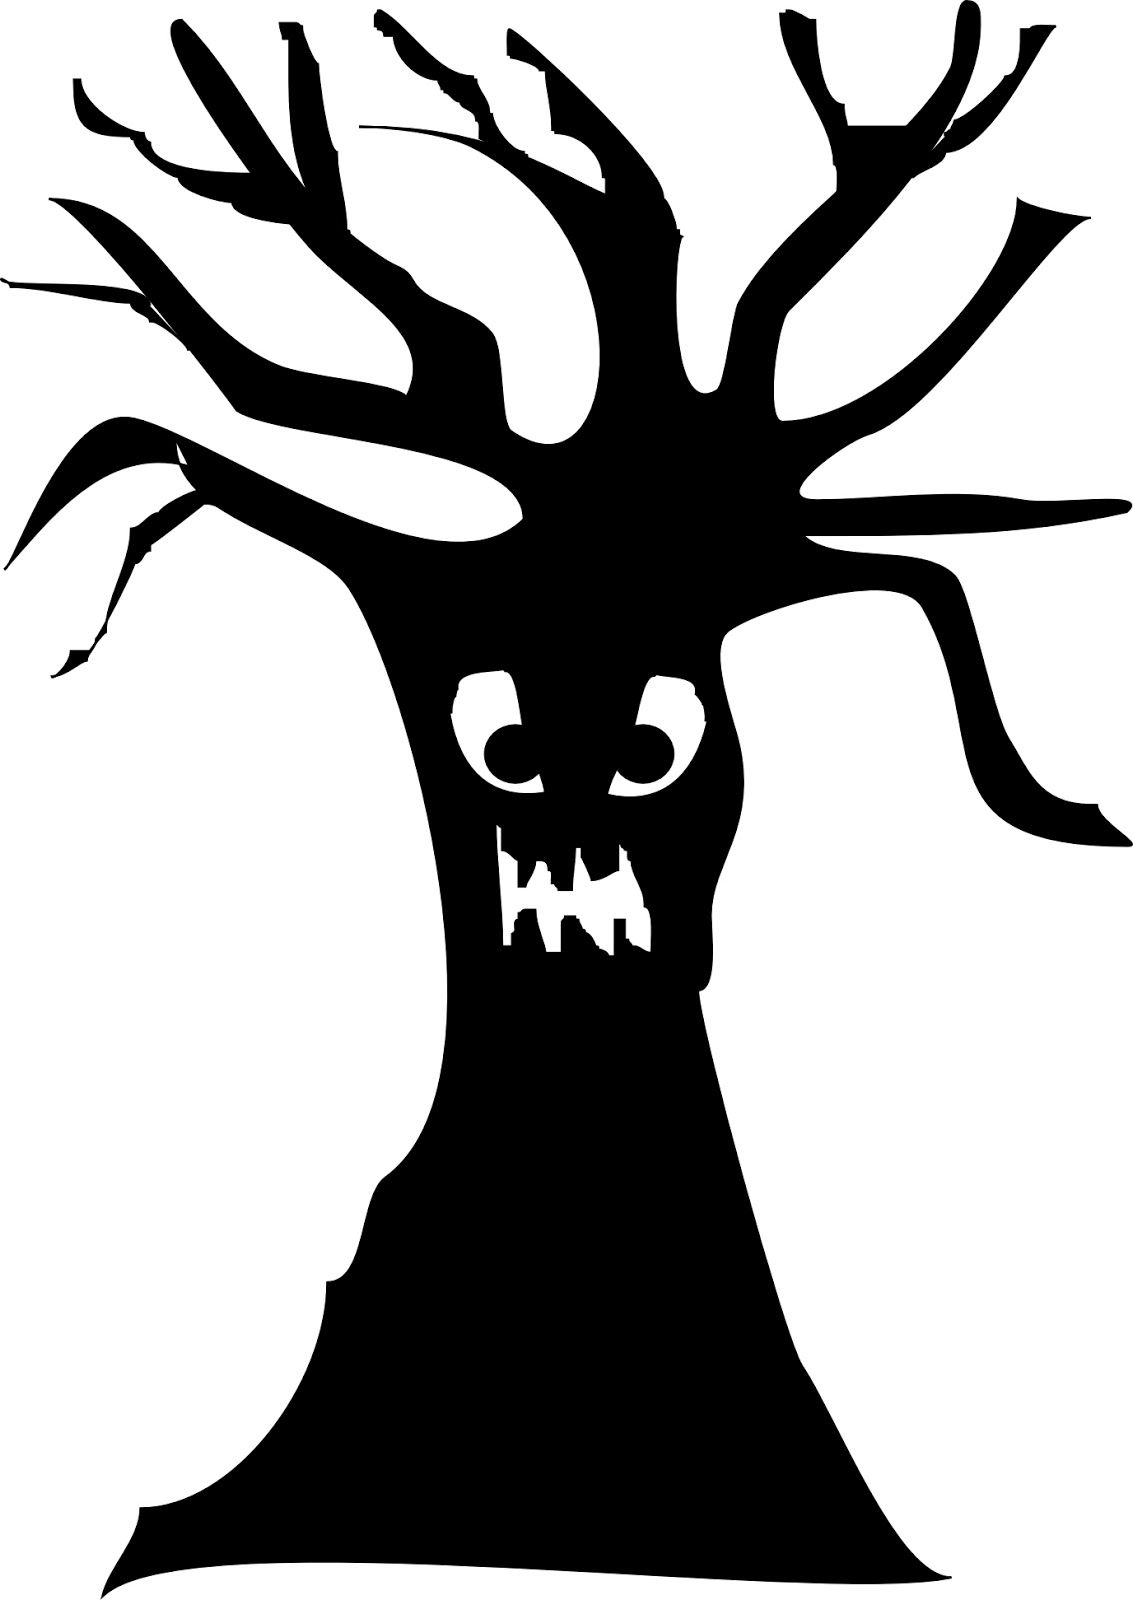 spooky tree silhouette google search halloween decorations rh pinterest com Halloween Tree Clip Art Creepy Tree Clip Art